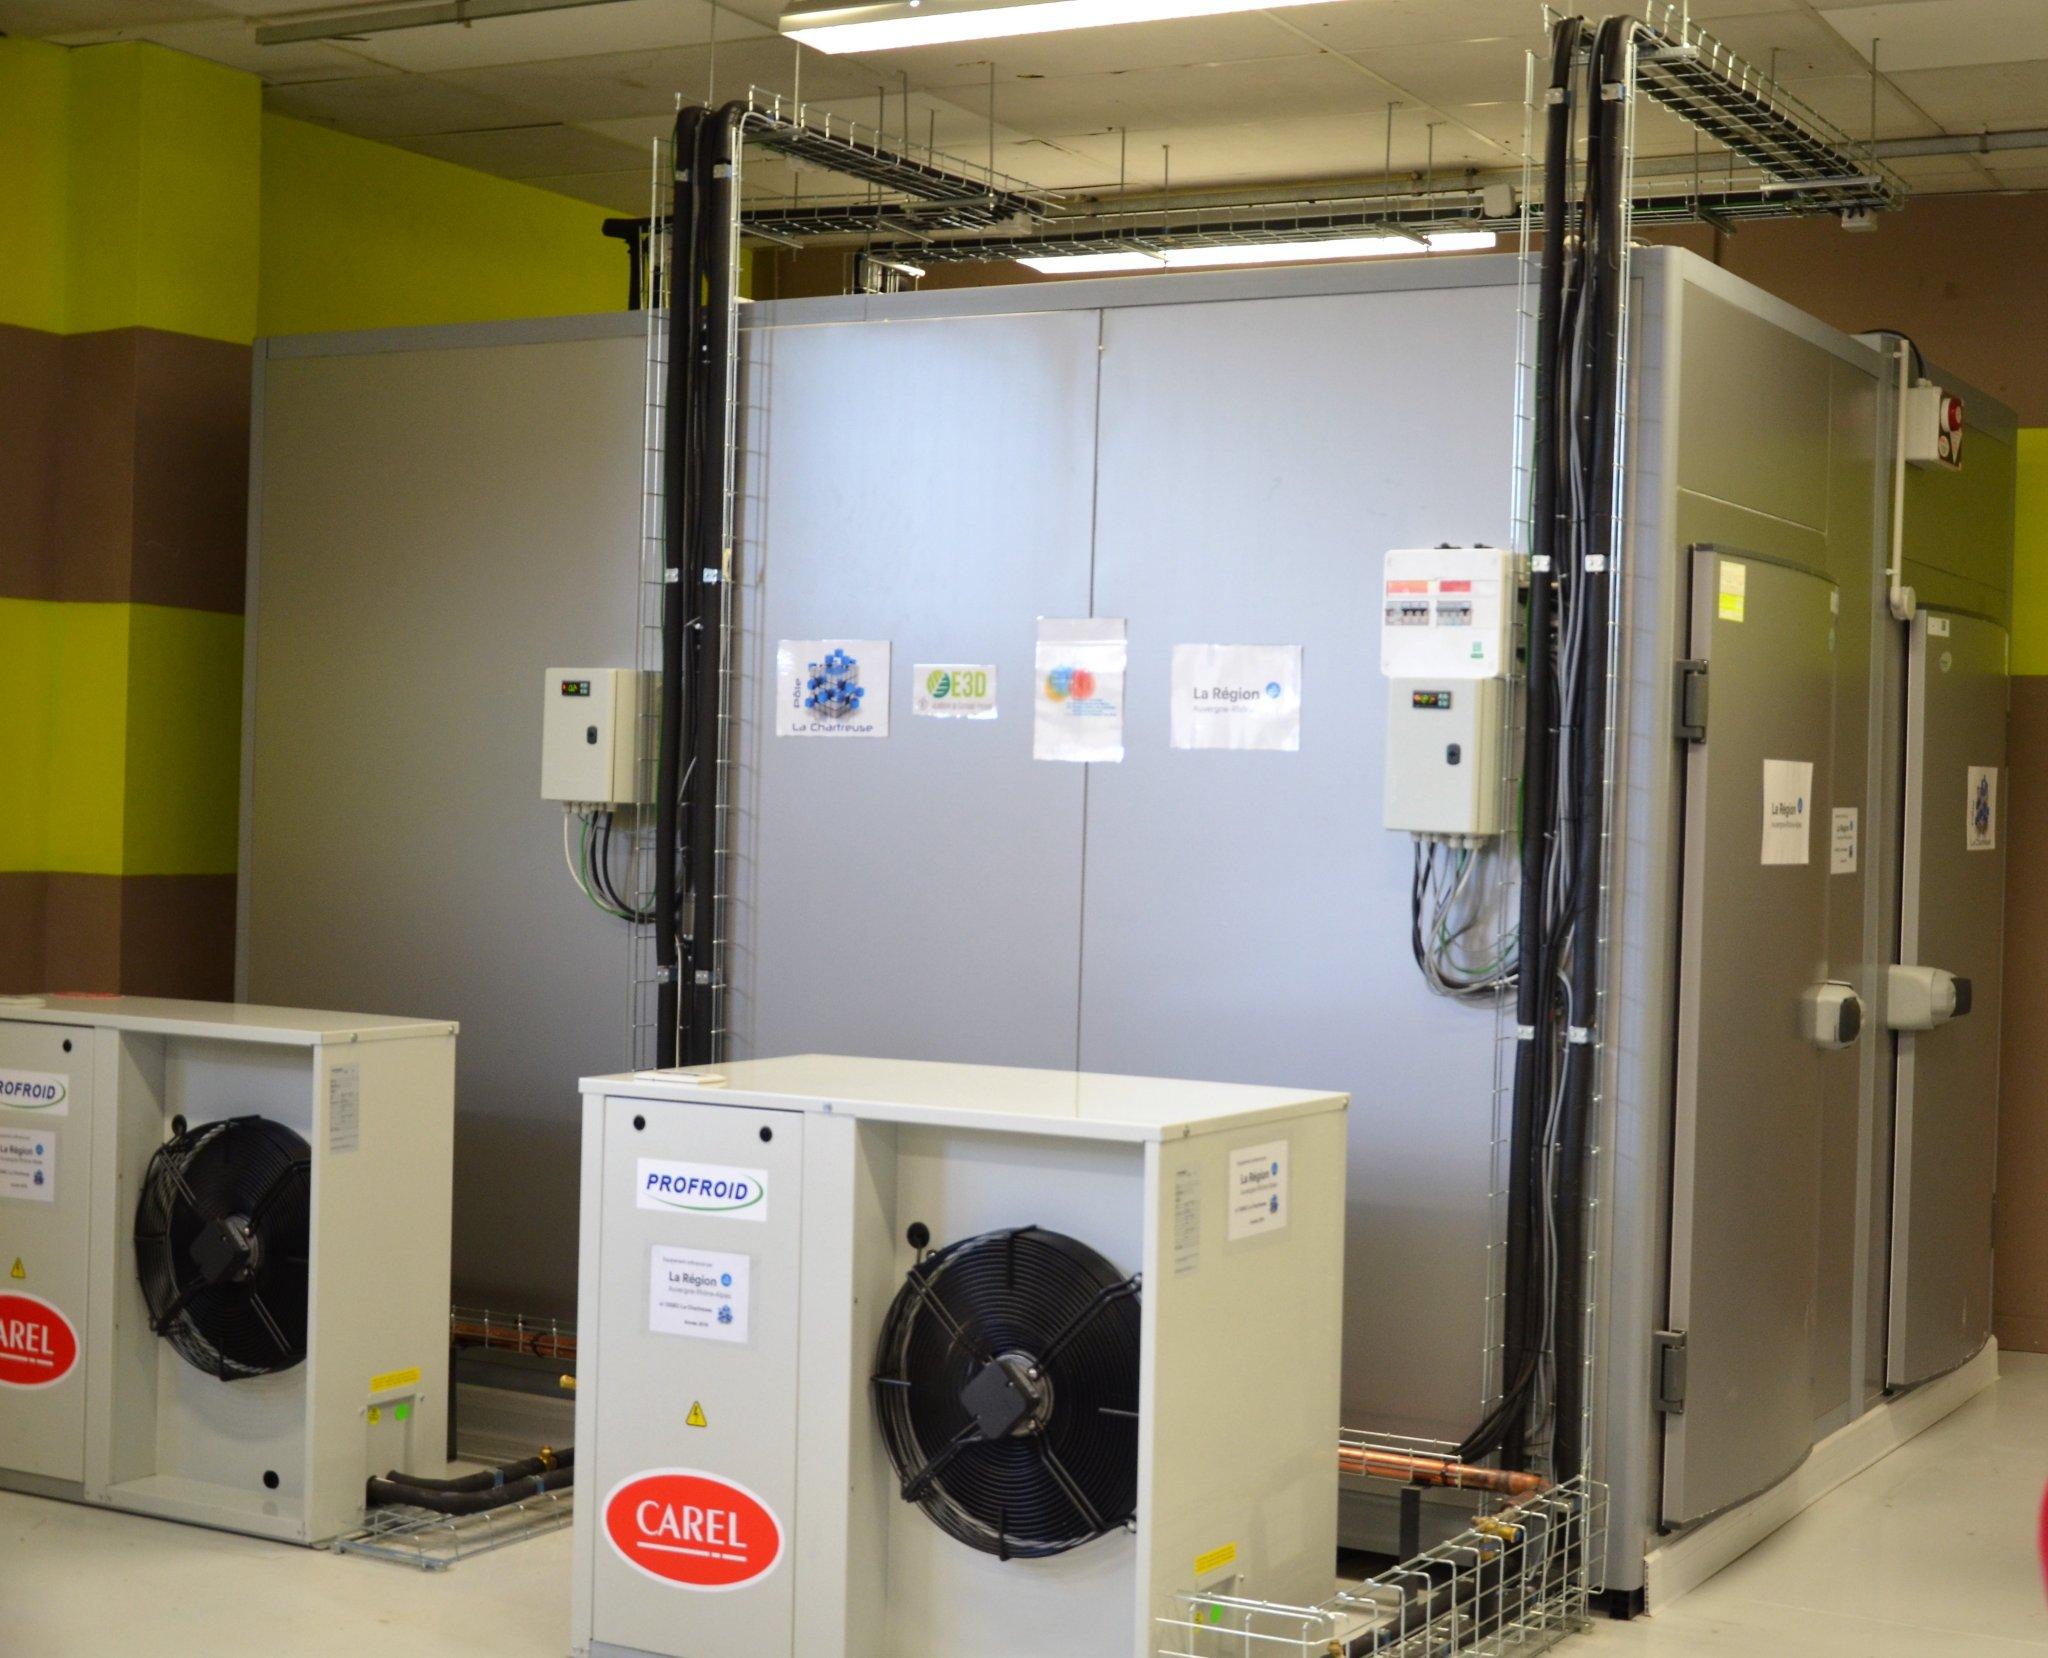 Inauguration de 2 chambres froides au CO2 2019